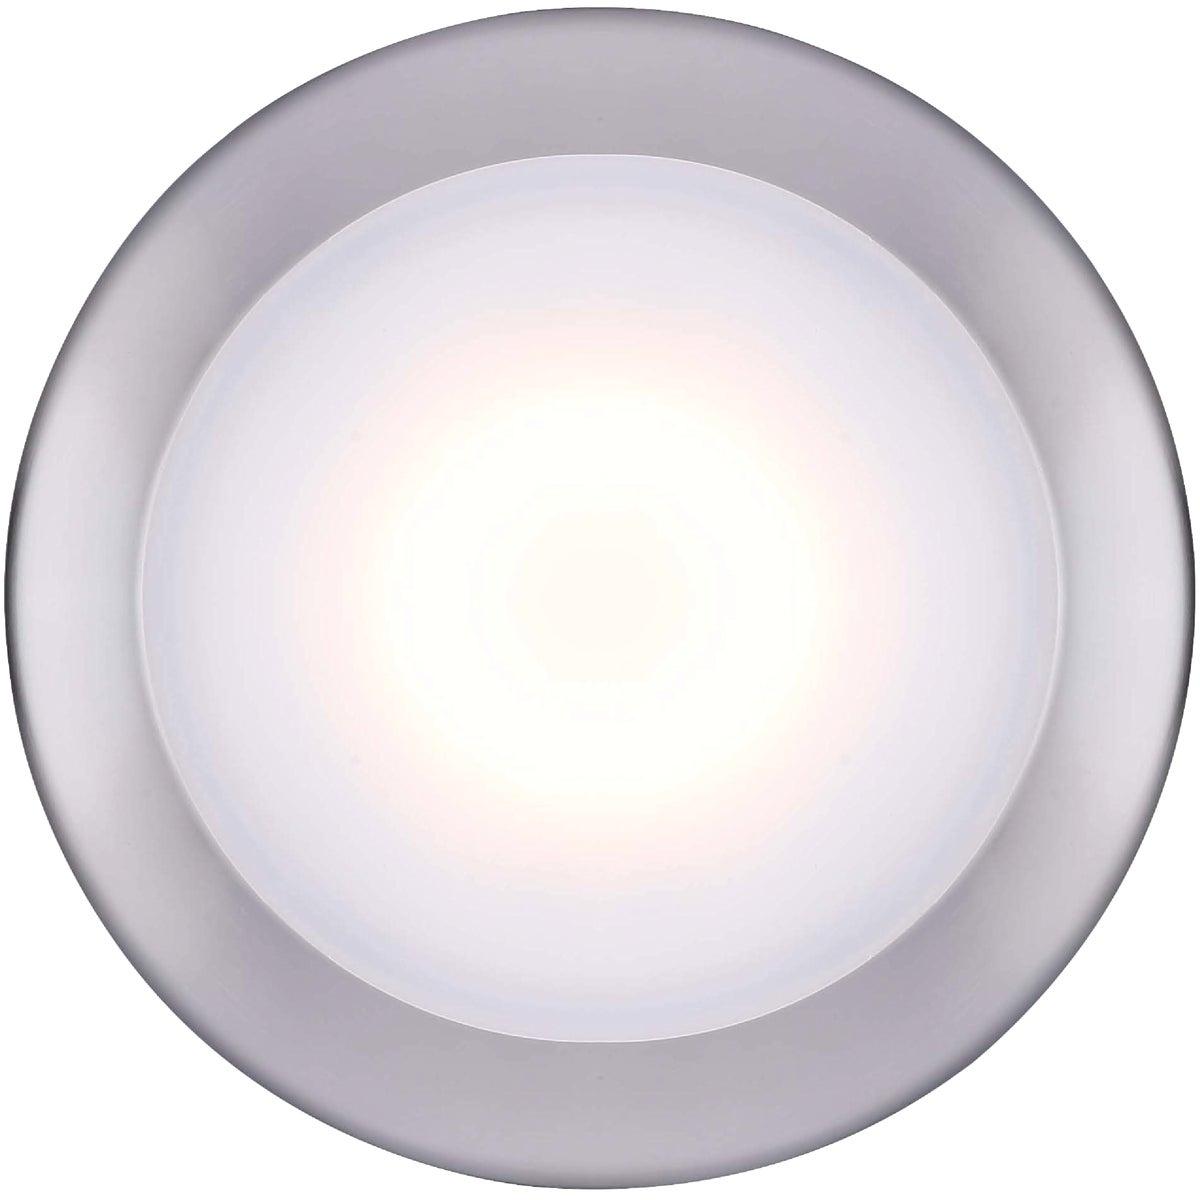 Canarm 6 In. Brushed Nickel LED Disc Flush Mount Light Fixture